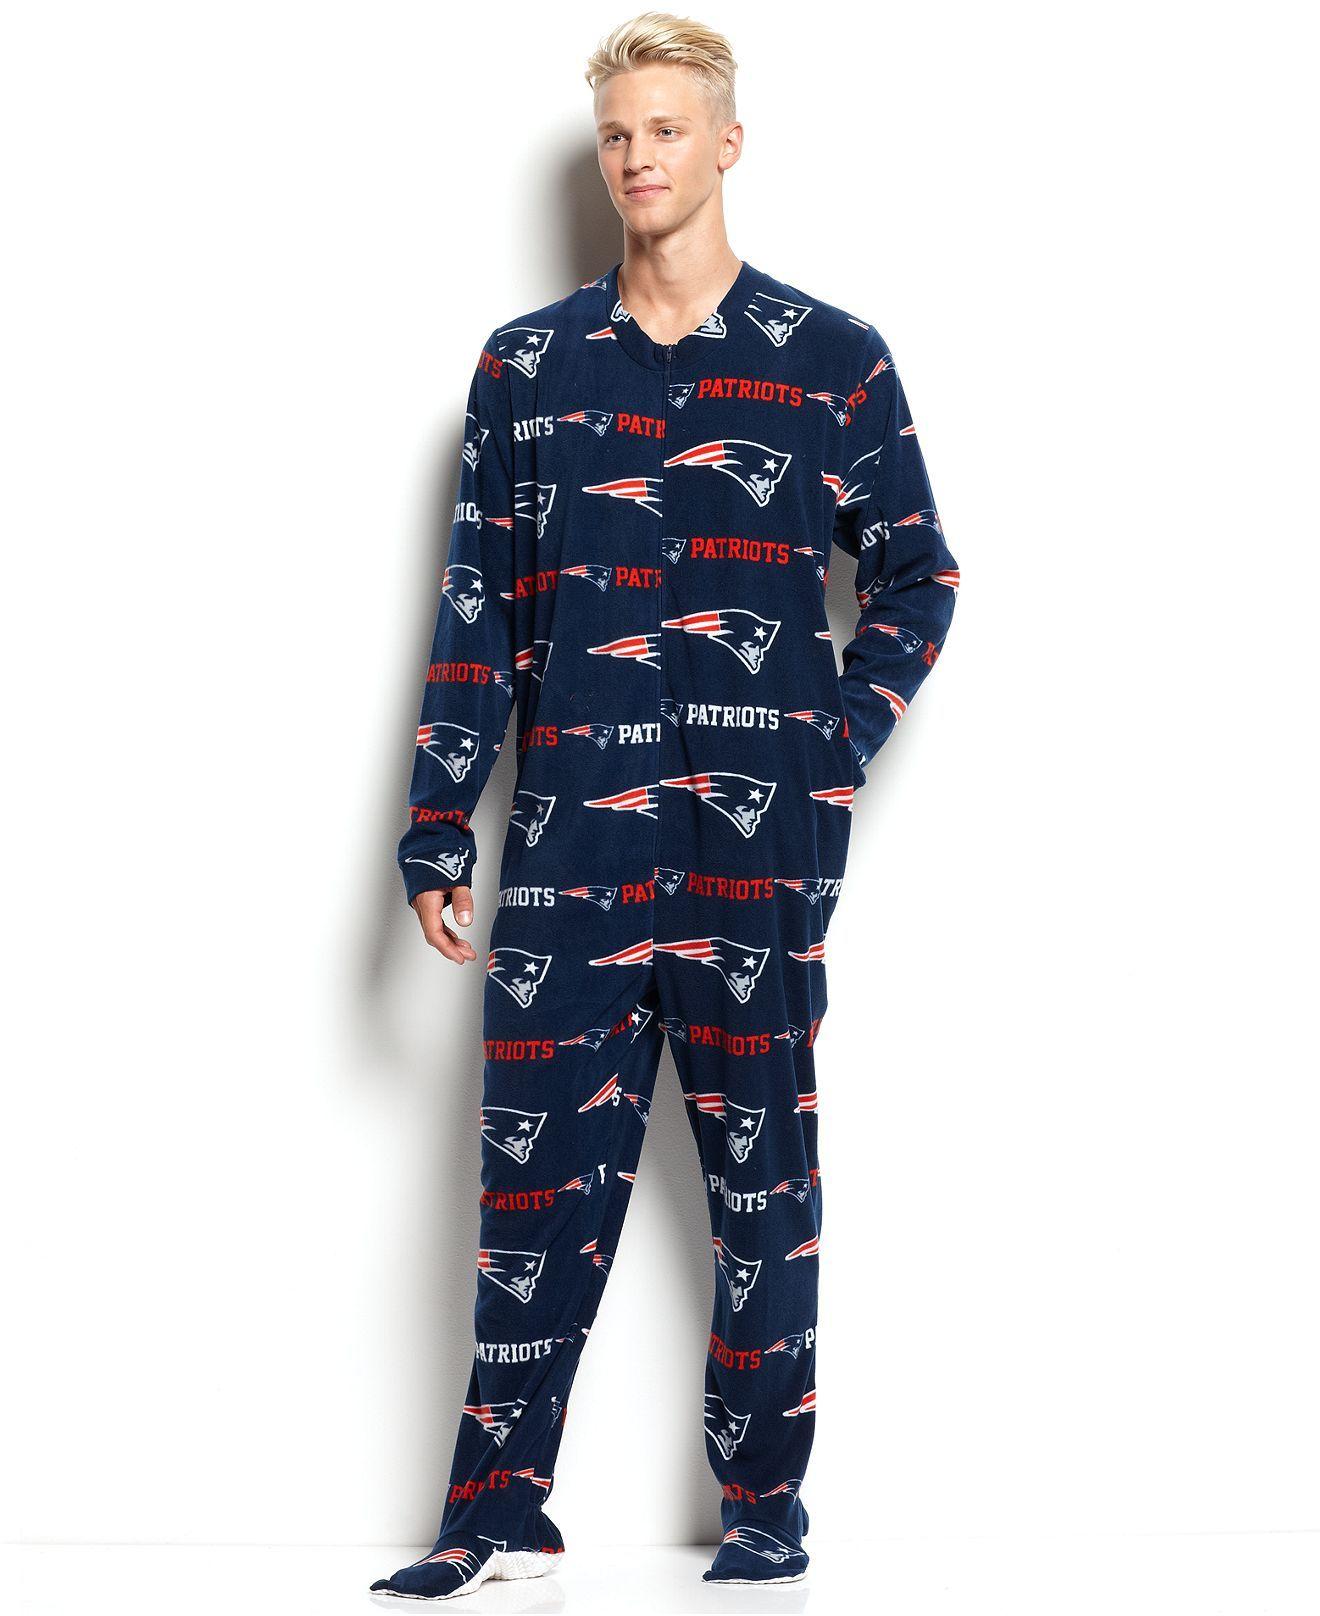 Nfl fleece footie they. Pajamas clipart comfy clothes